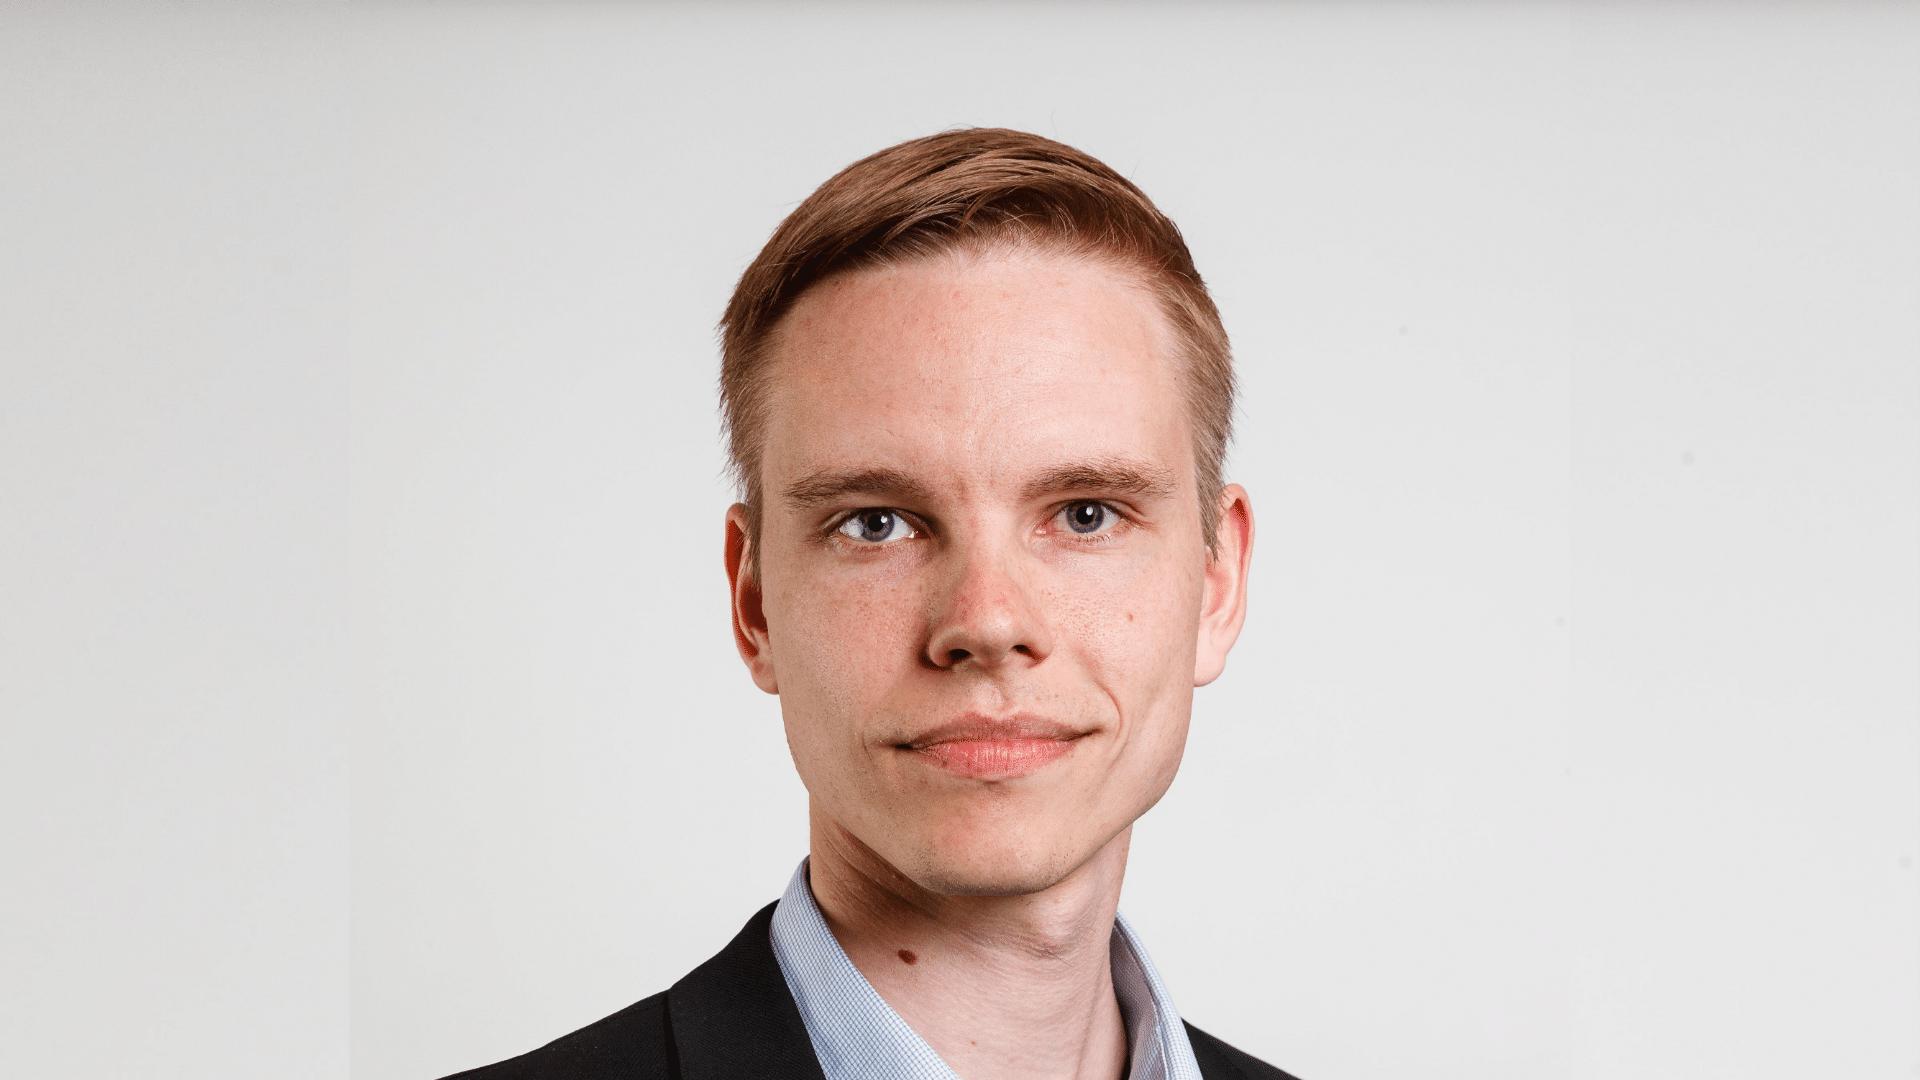 Mikko-Parkkila-Radientum-Entrepreneurs-of-Finland-Finnish-Business